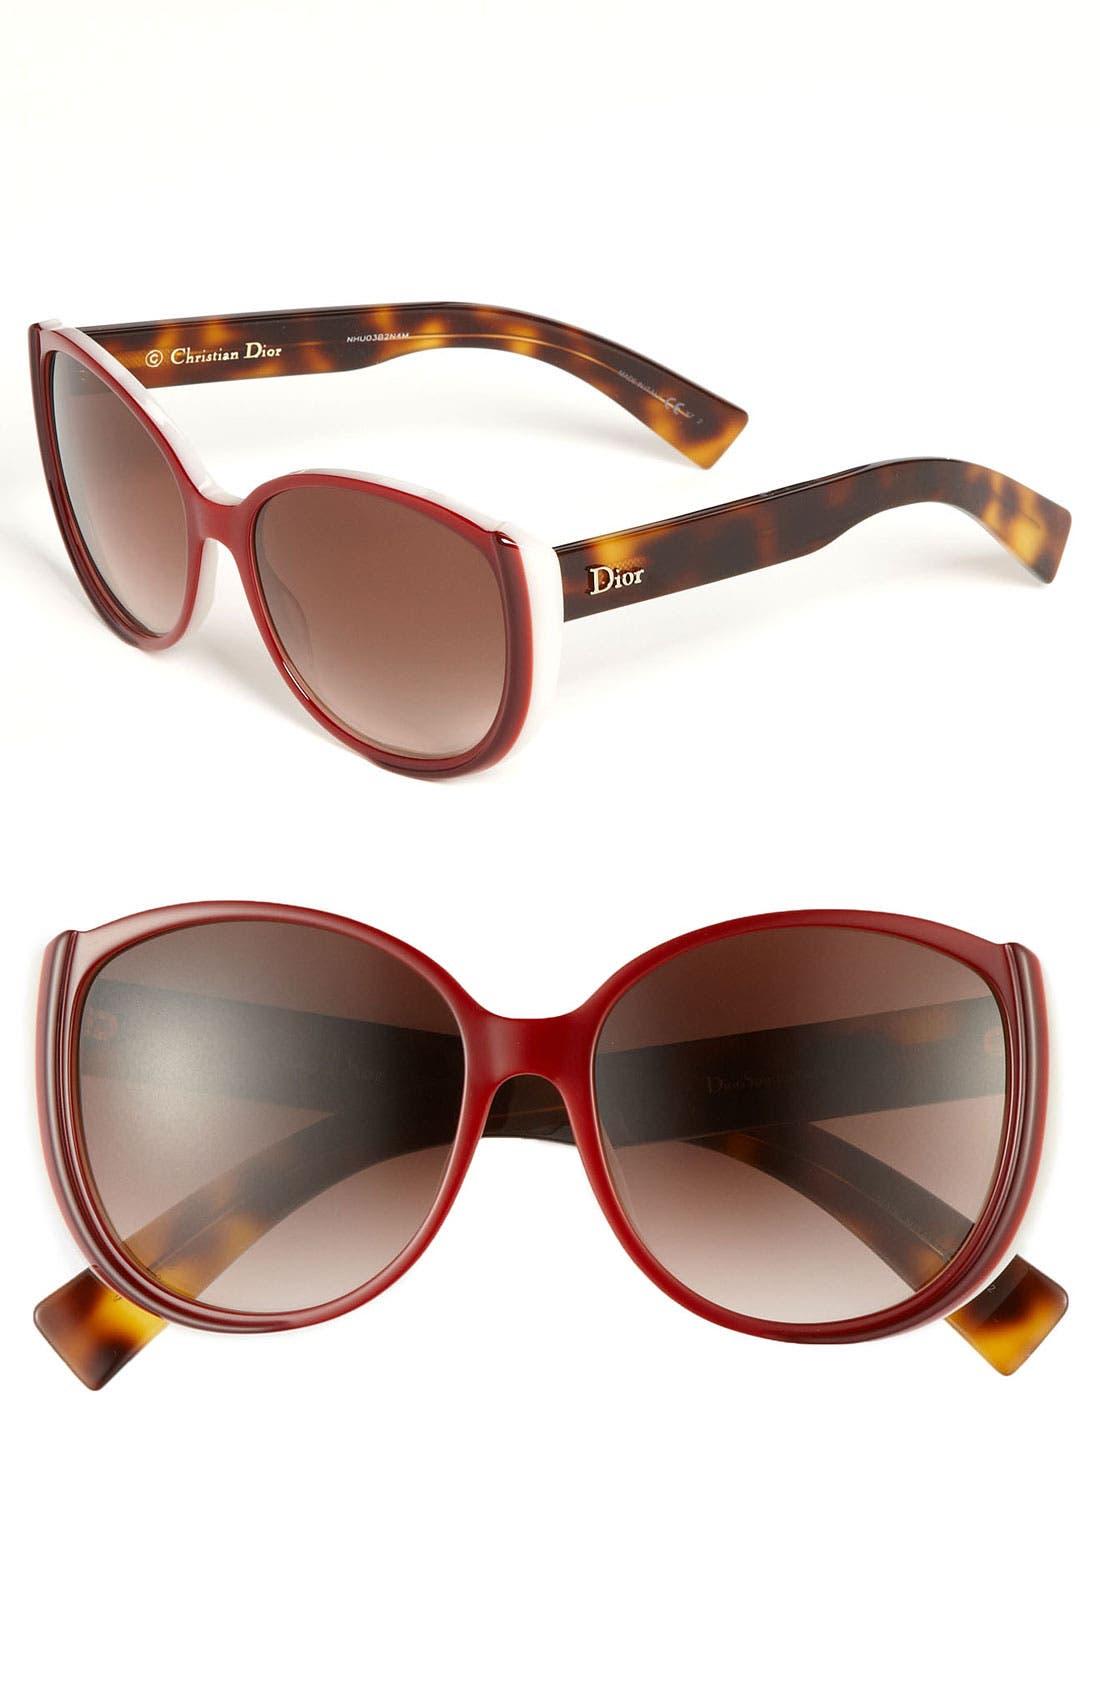 Alternate Image 1 Selected - Dior 'Summer' 56mm Retro Sunglasses